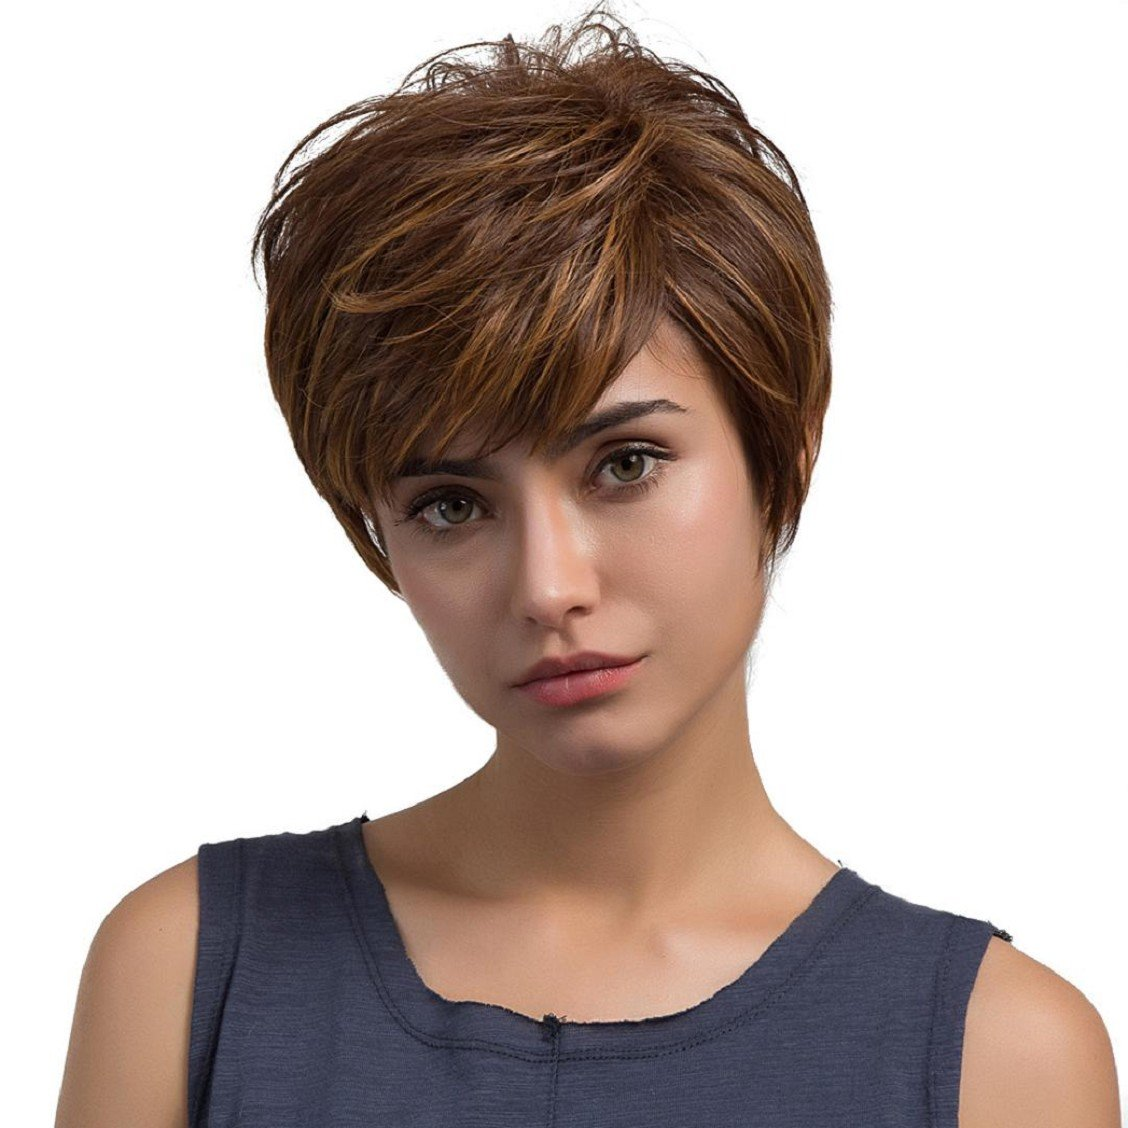 Naladoo Women Girls Wig,Natural Light Brown Straight Short Hair Wigs Short Women's Fashion Wig New